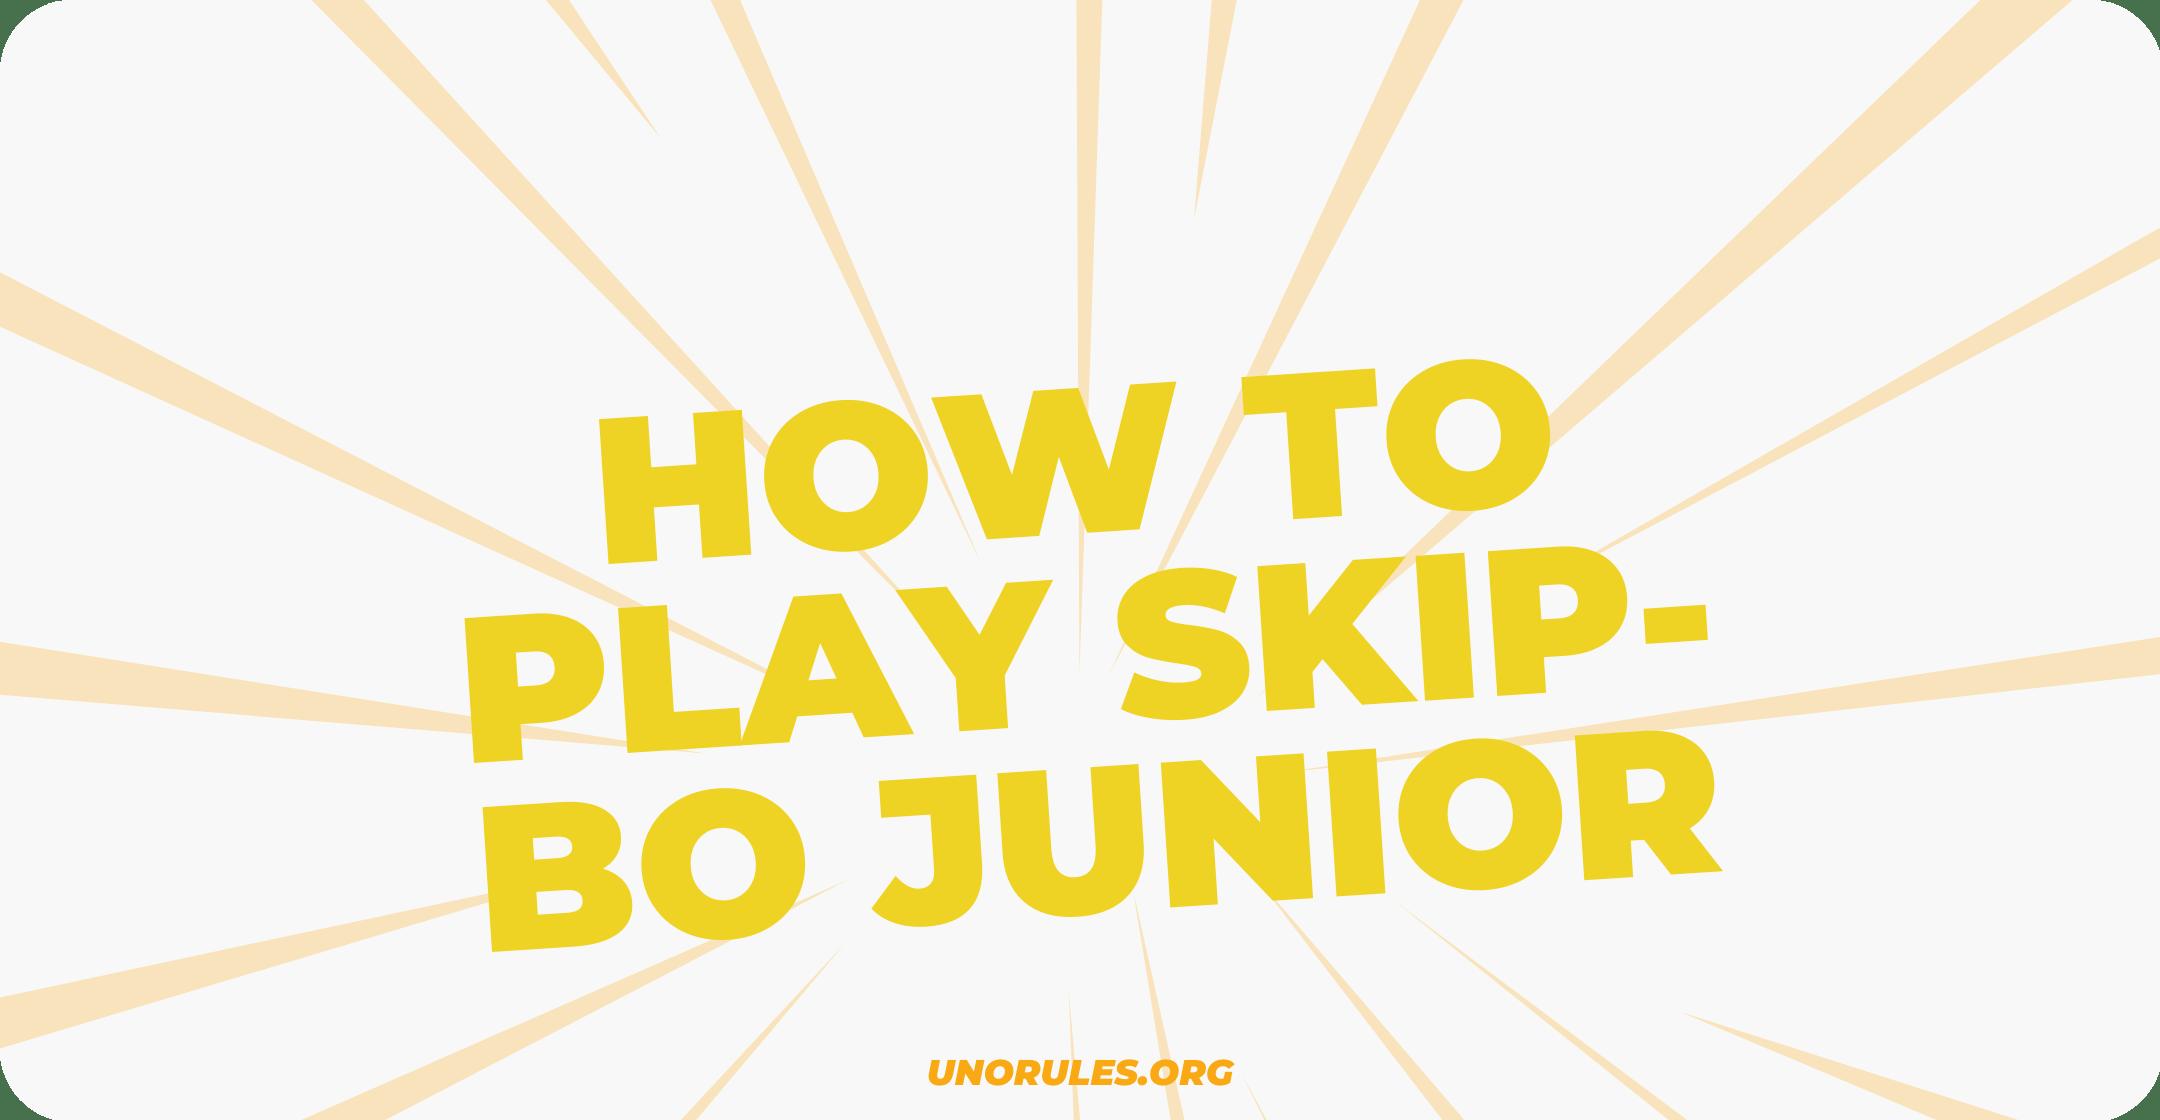 How to play Skip-Bo junior